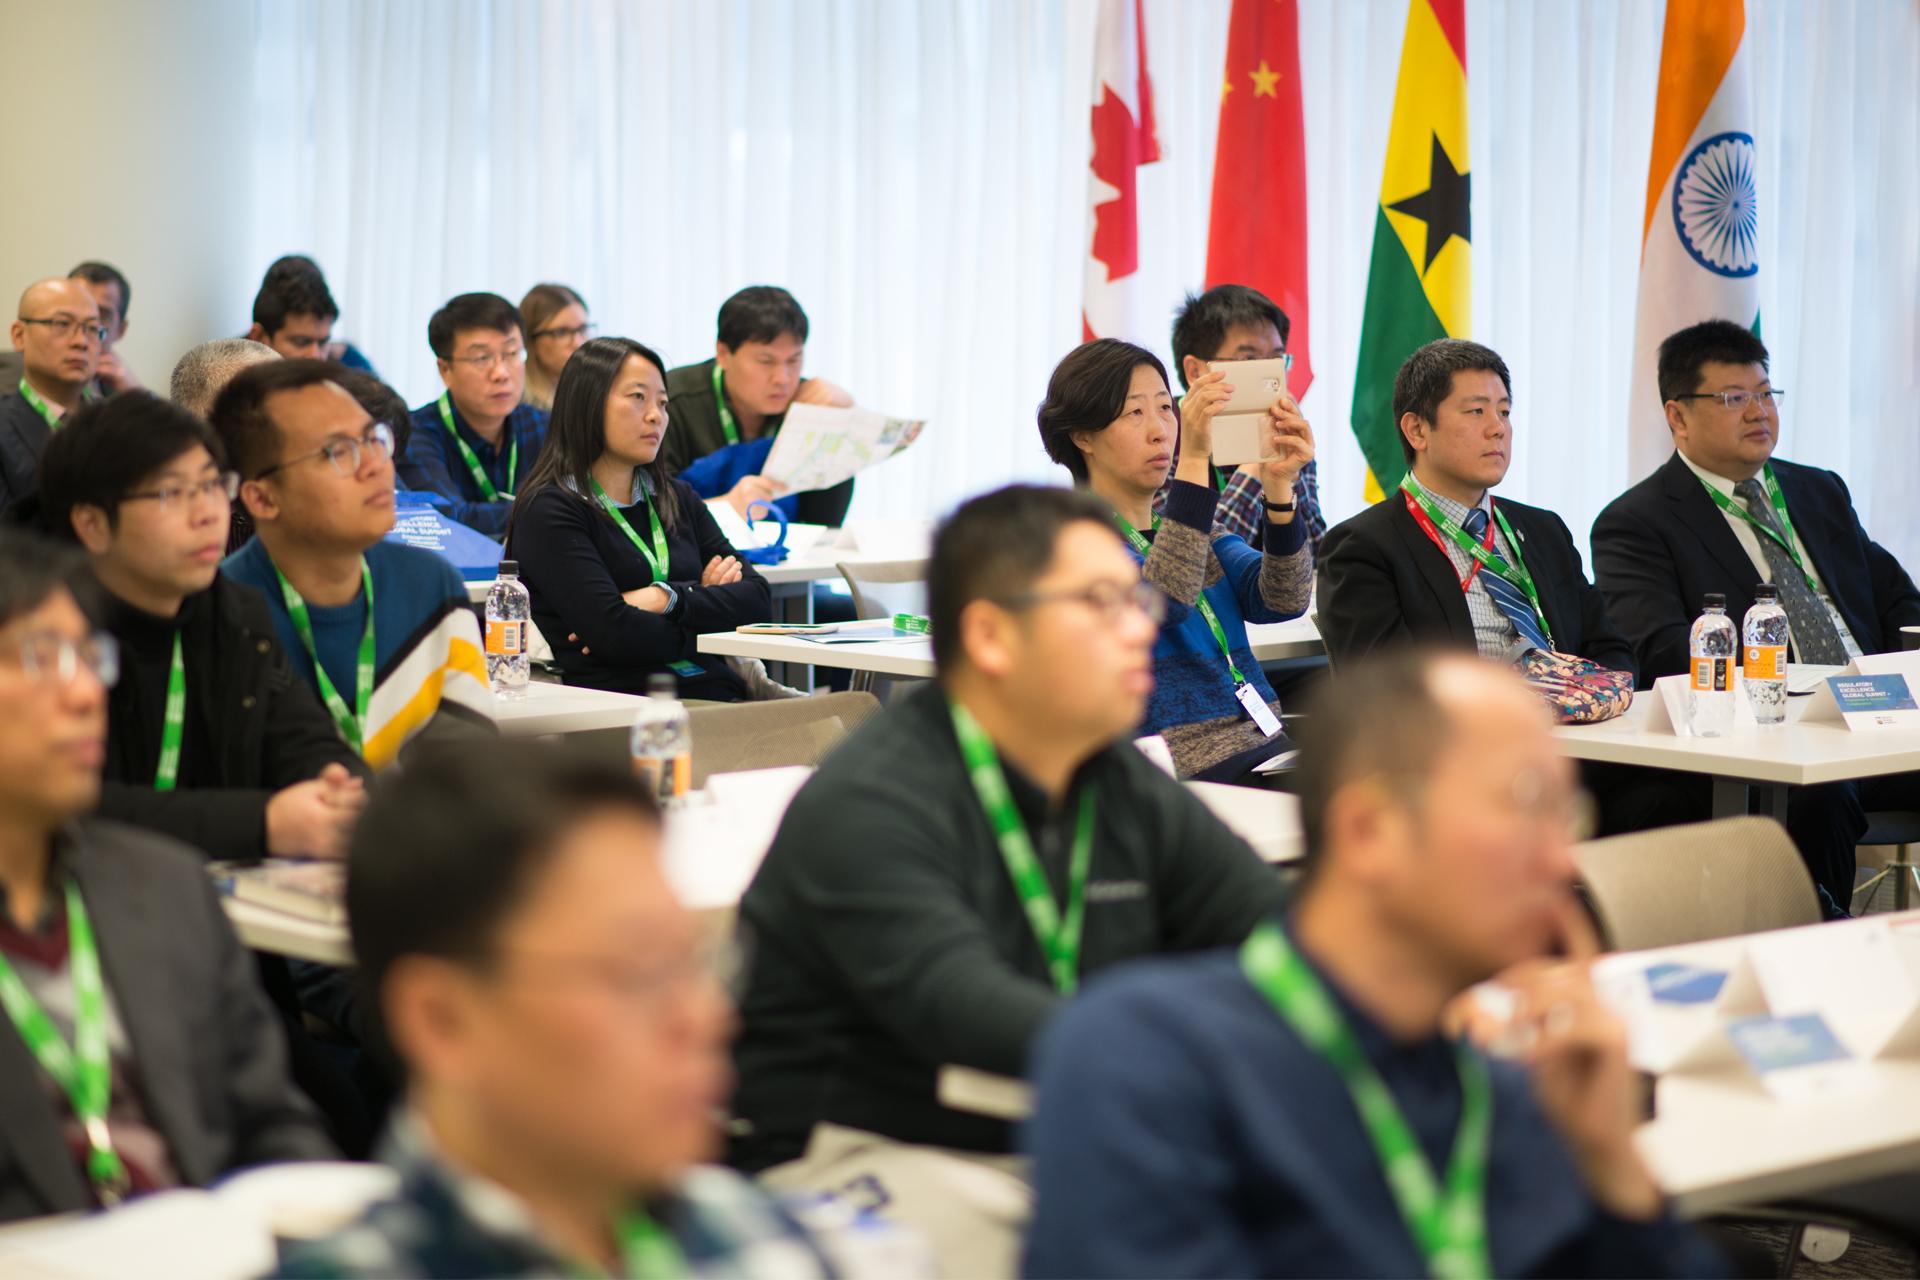 International delegates listen to AER president and CEO Jim Ellis discuss regulatory excellence.